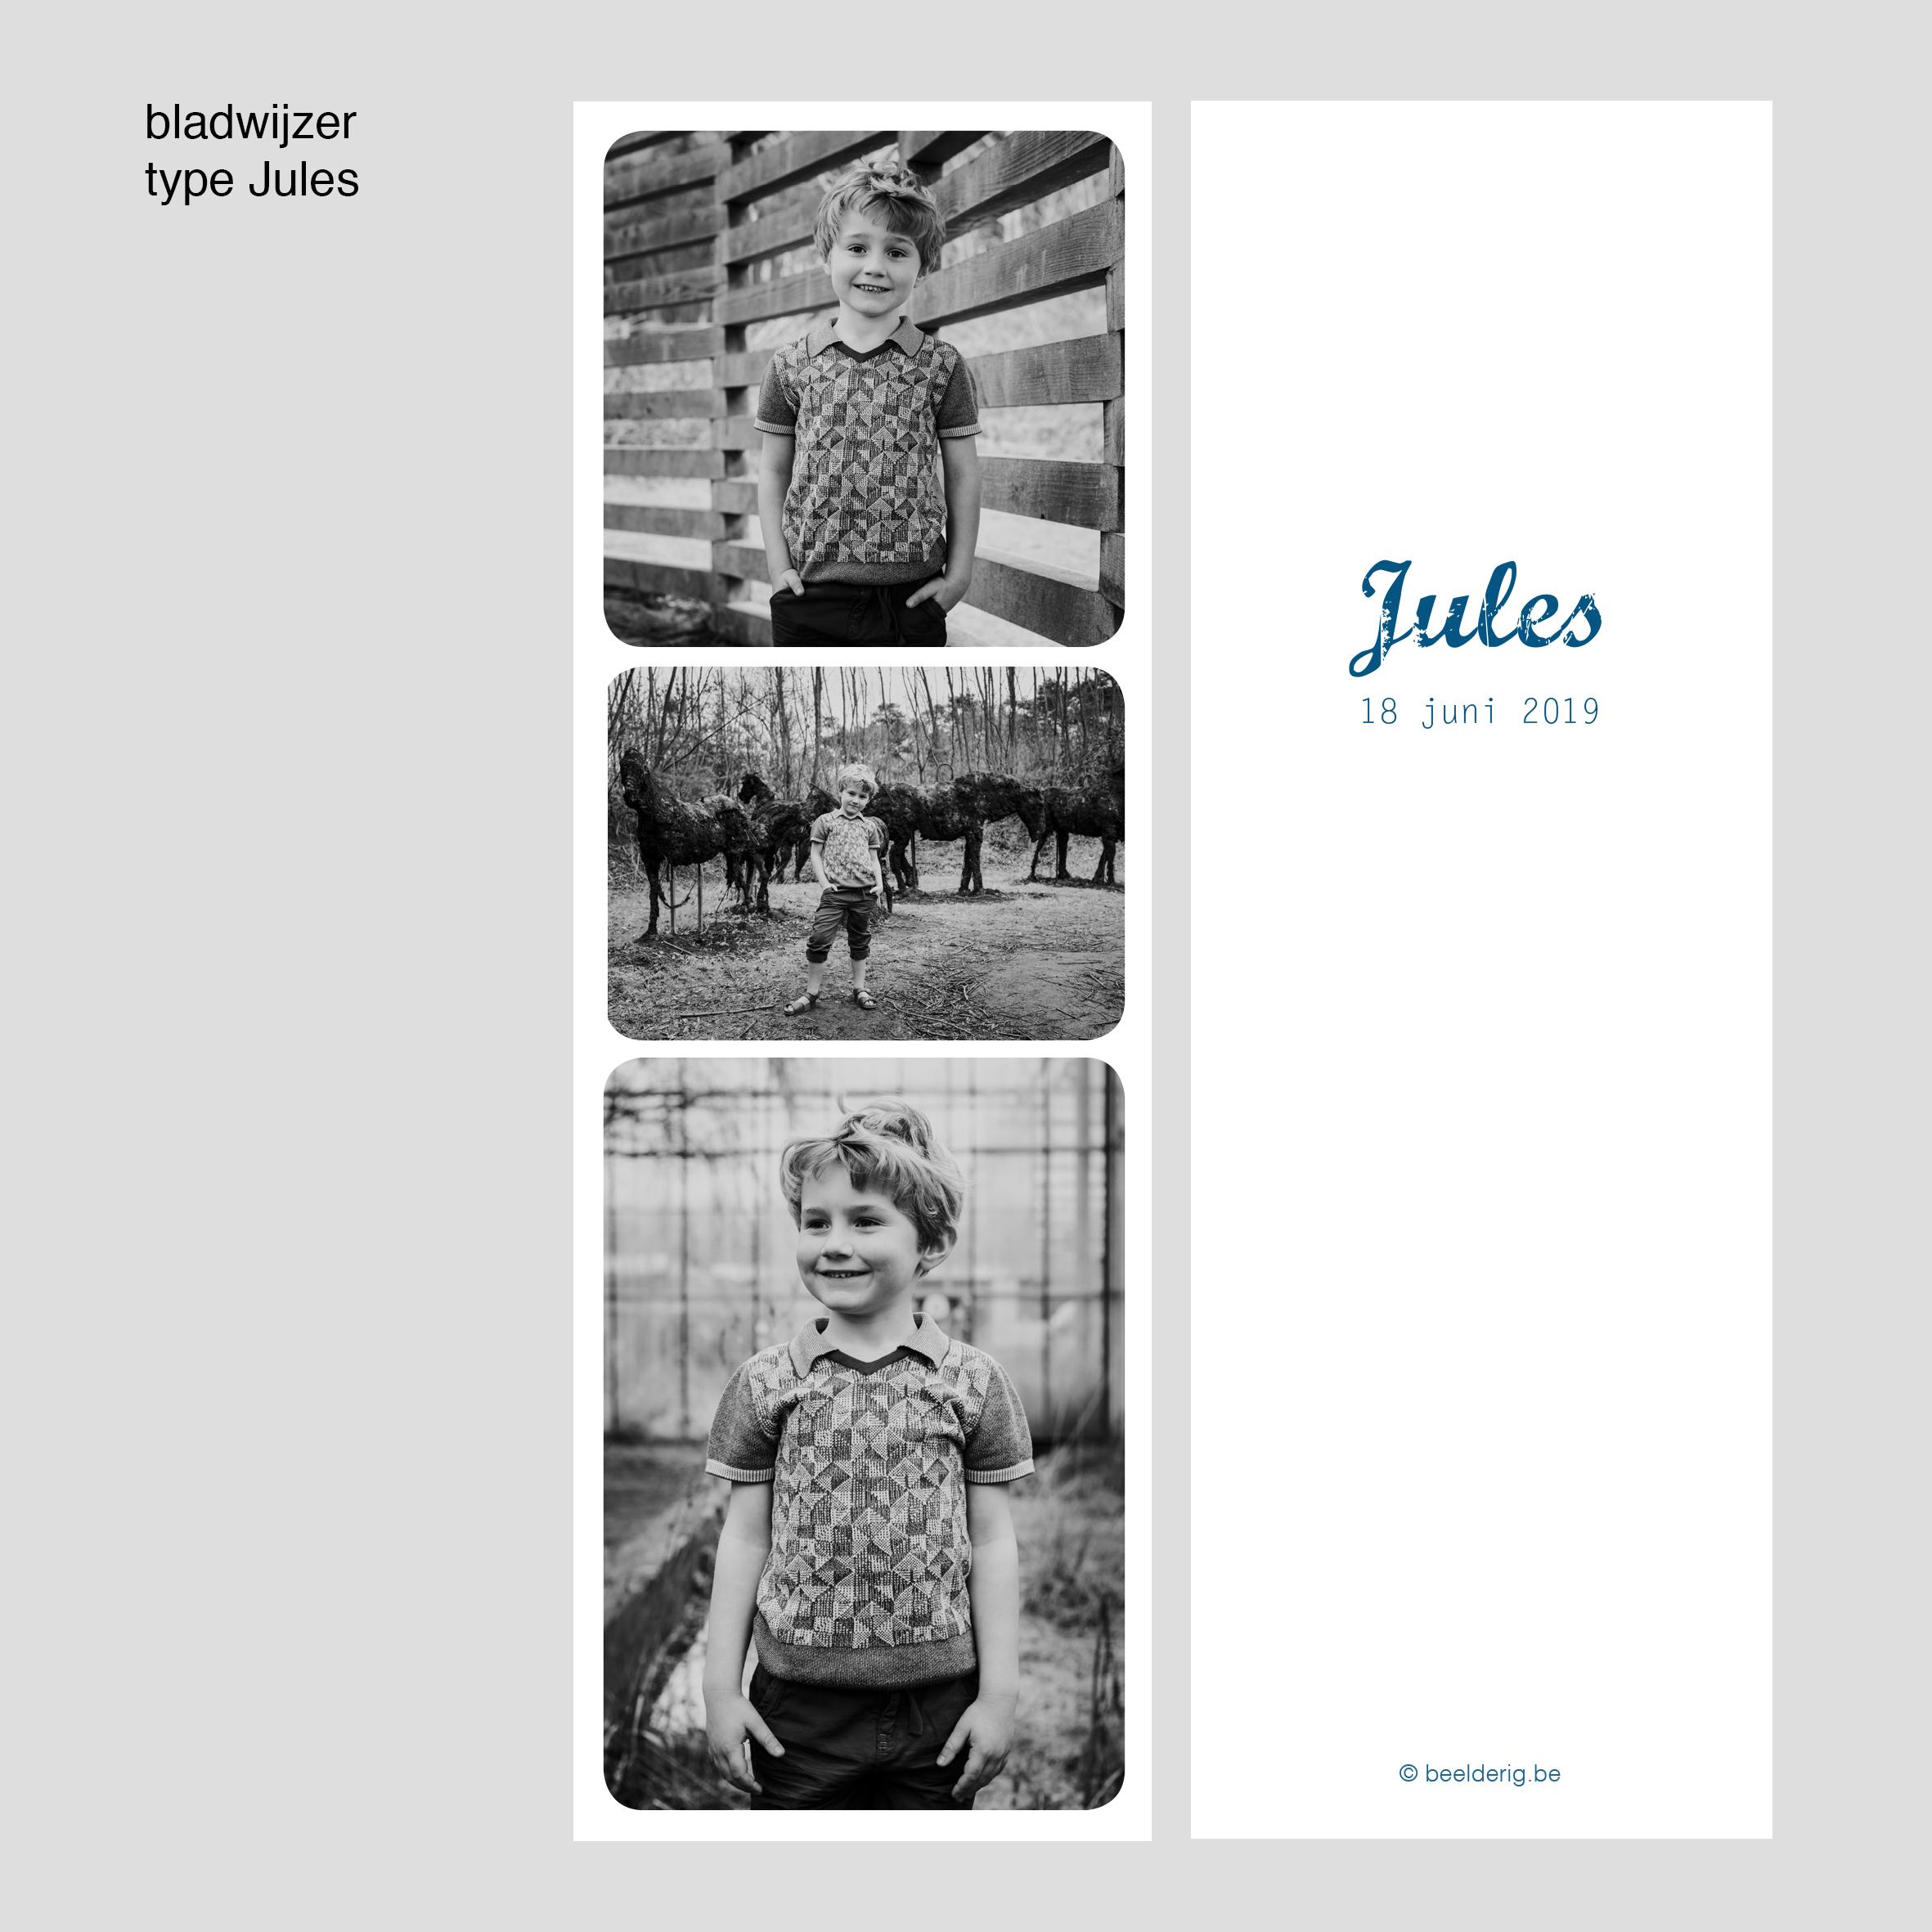 bladwijzer_jules